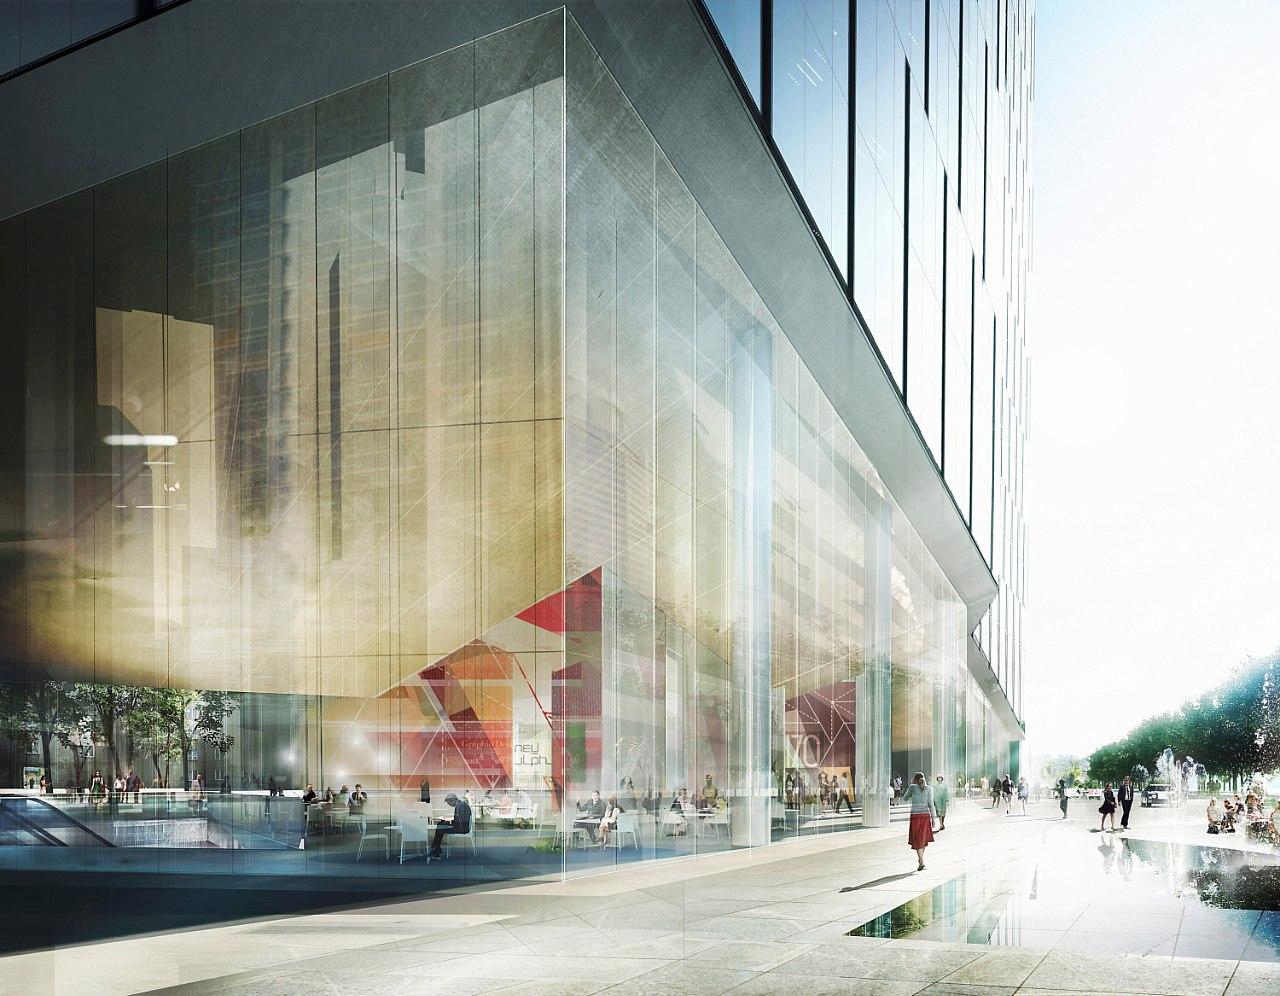 Office Tower Warsaw By Schmidt Hammer Lassen Architects